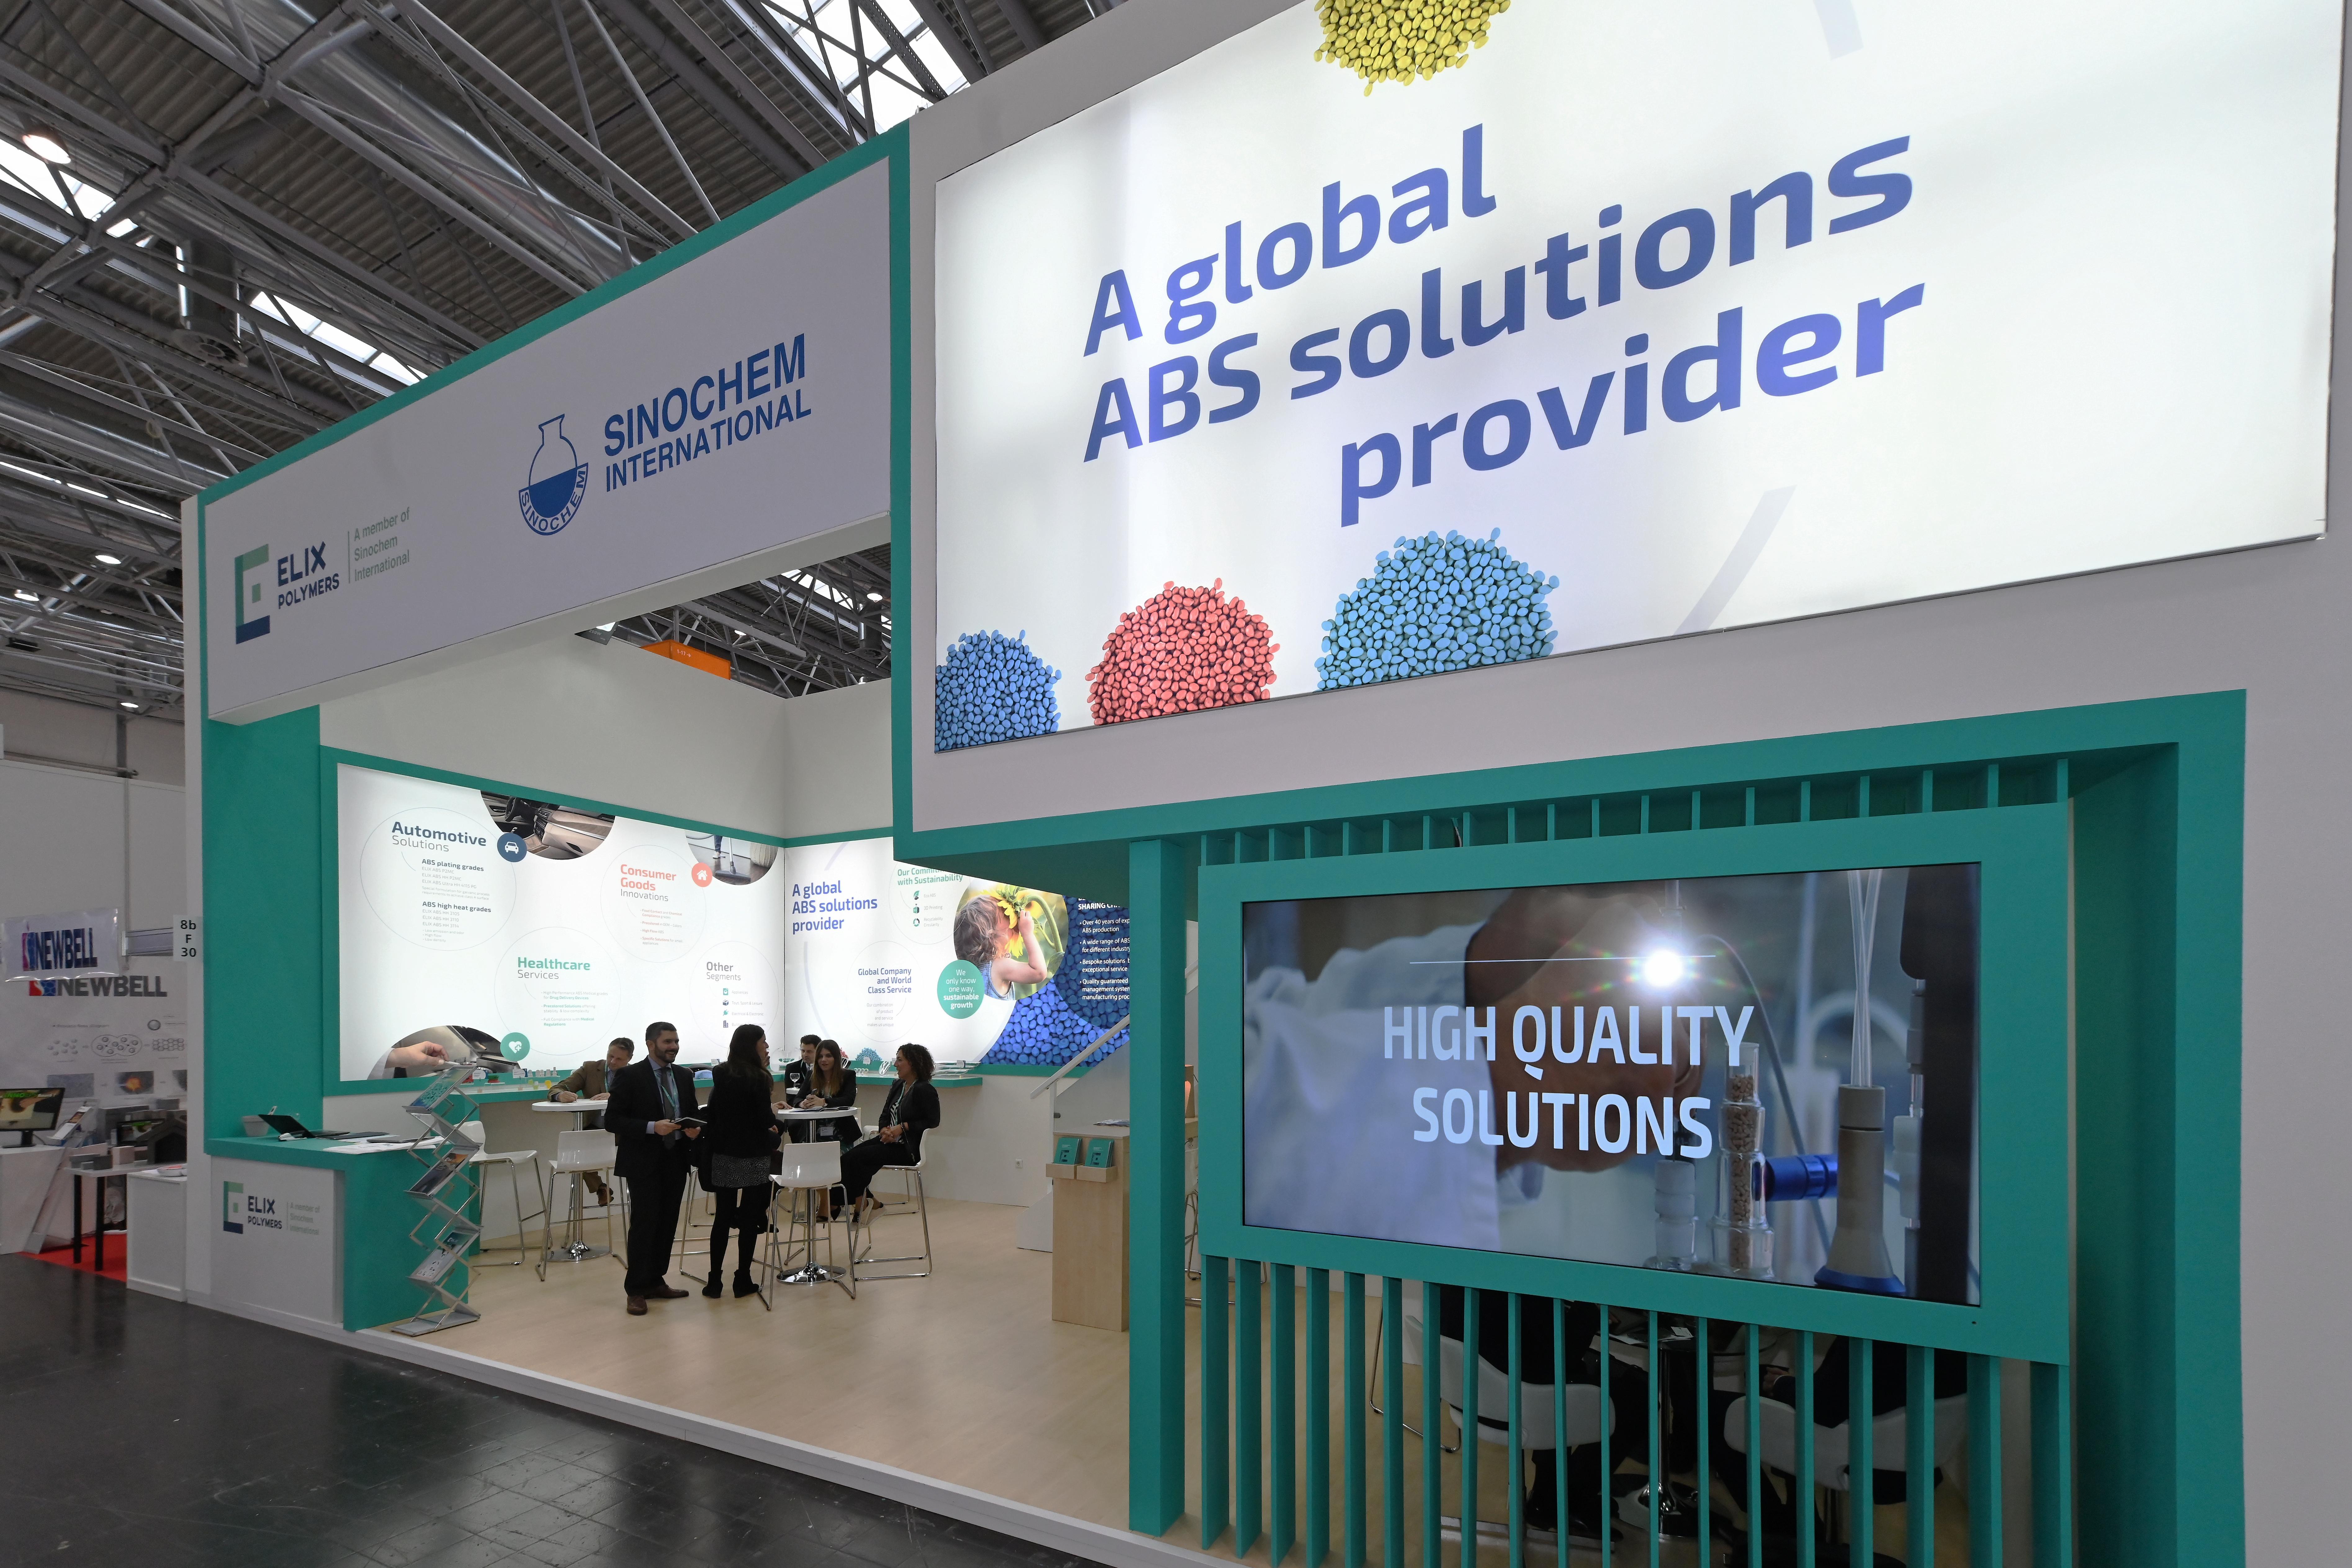 K Trade Fair, ABS Solutions